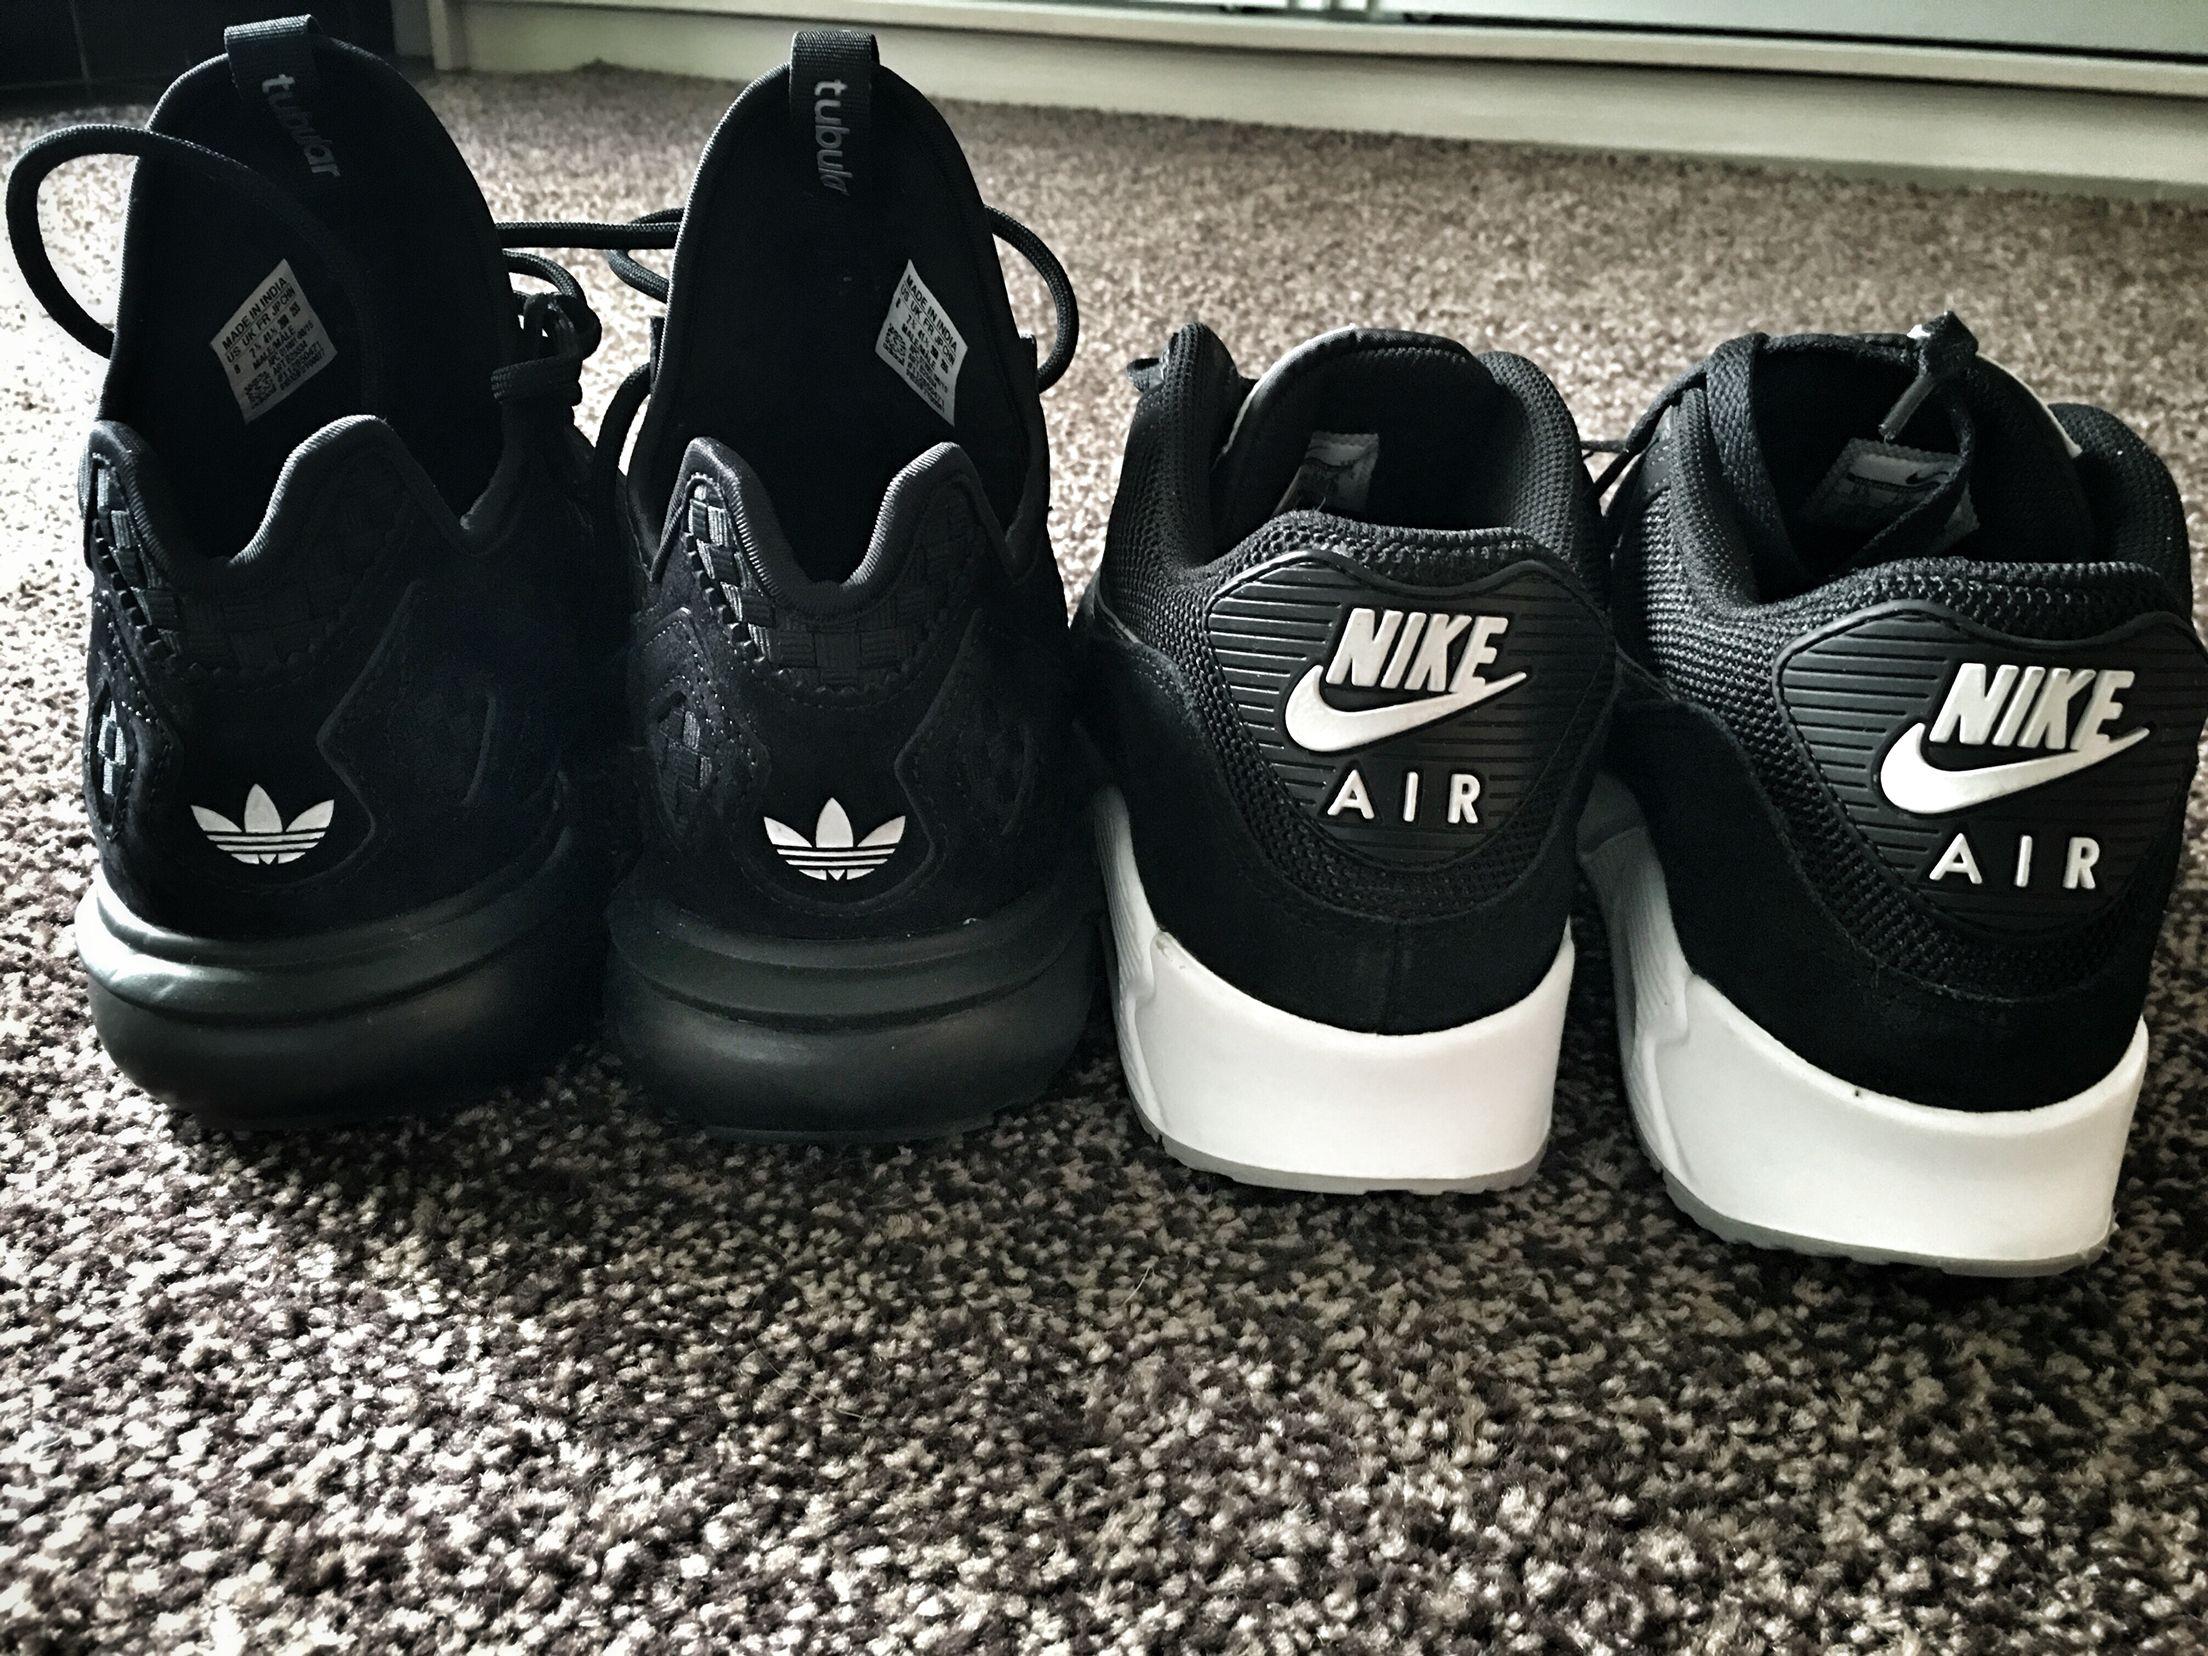 nike vs adidas sneakers